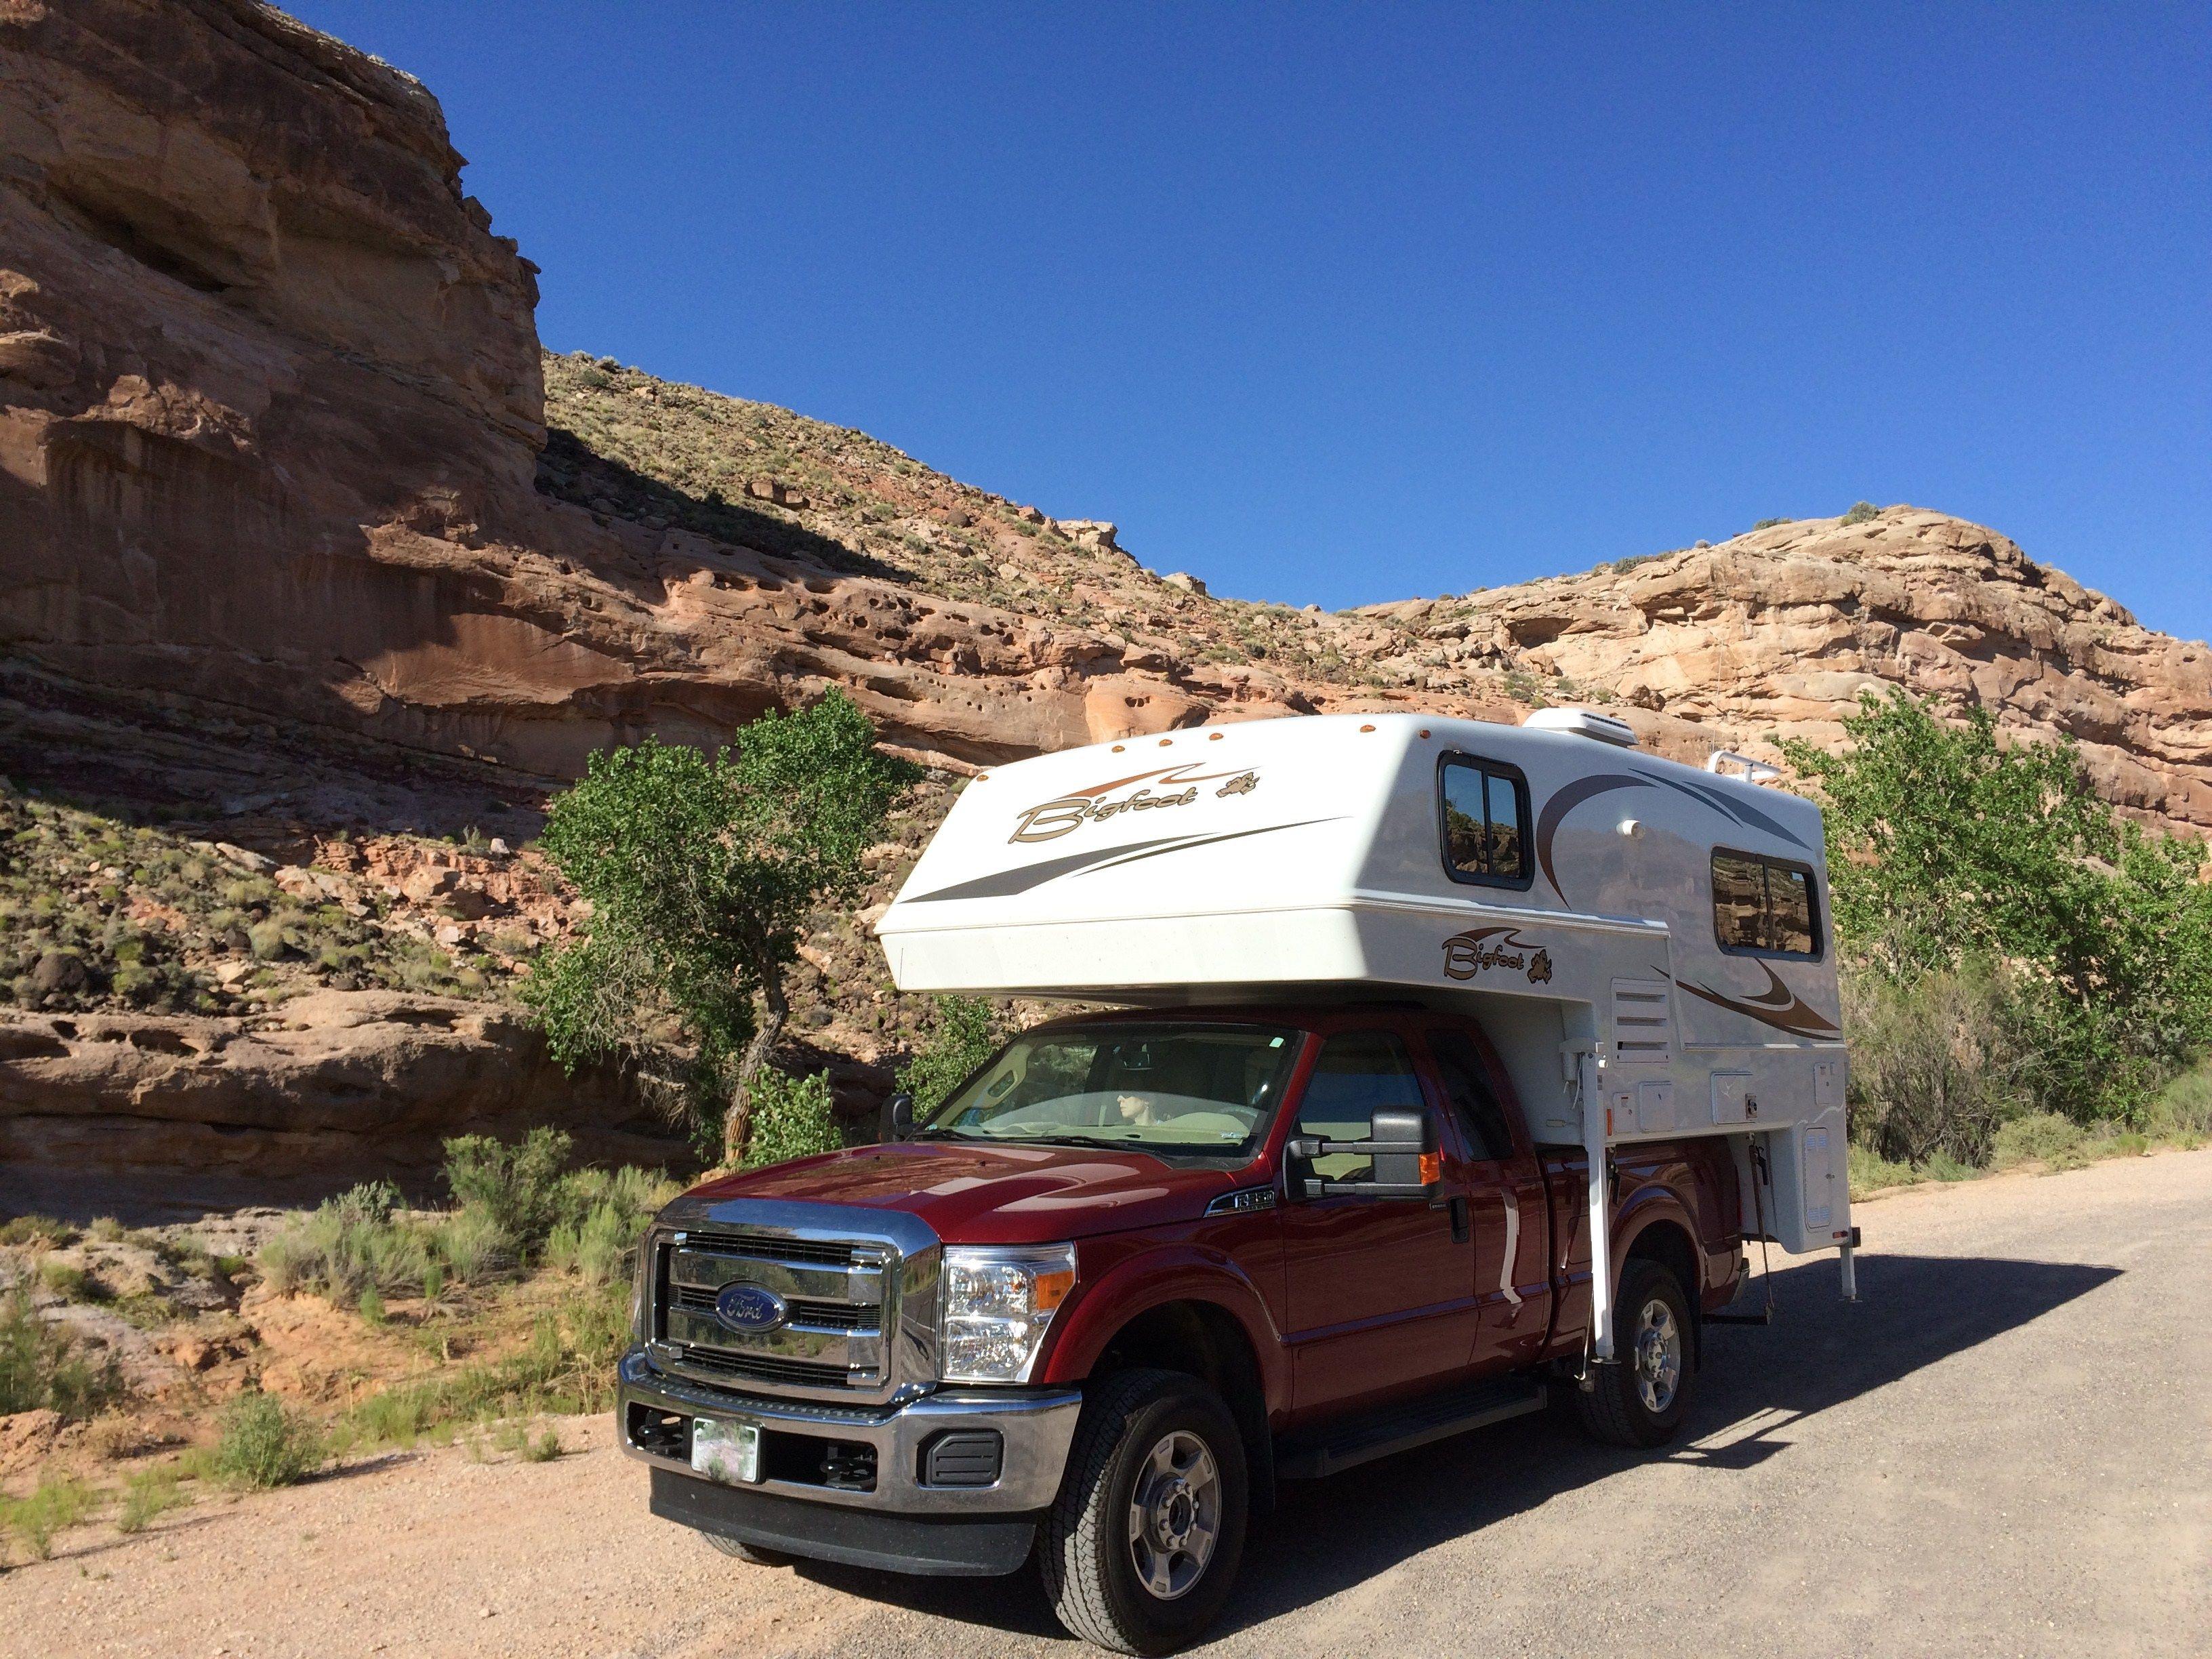 Bigfoot 25c9 4sb Review Truck Camper Adventure Campers